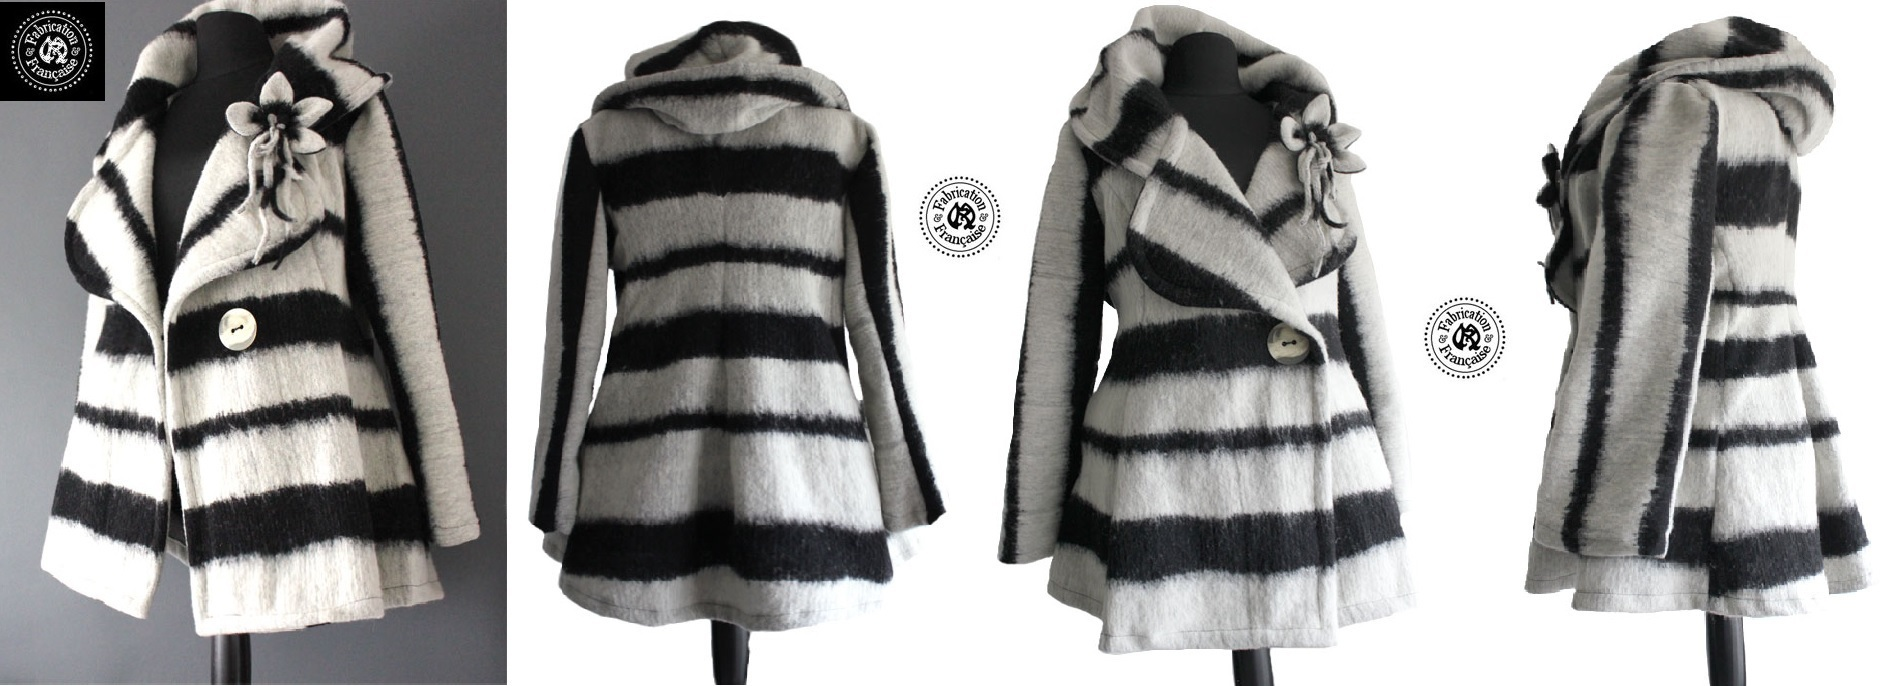 veste caban laine ecru et noir 4 vues bis.jpg 0be7afeec91